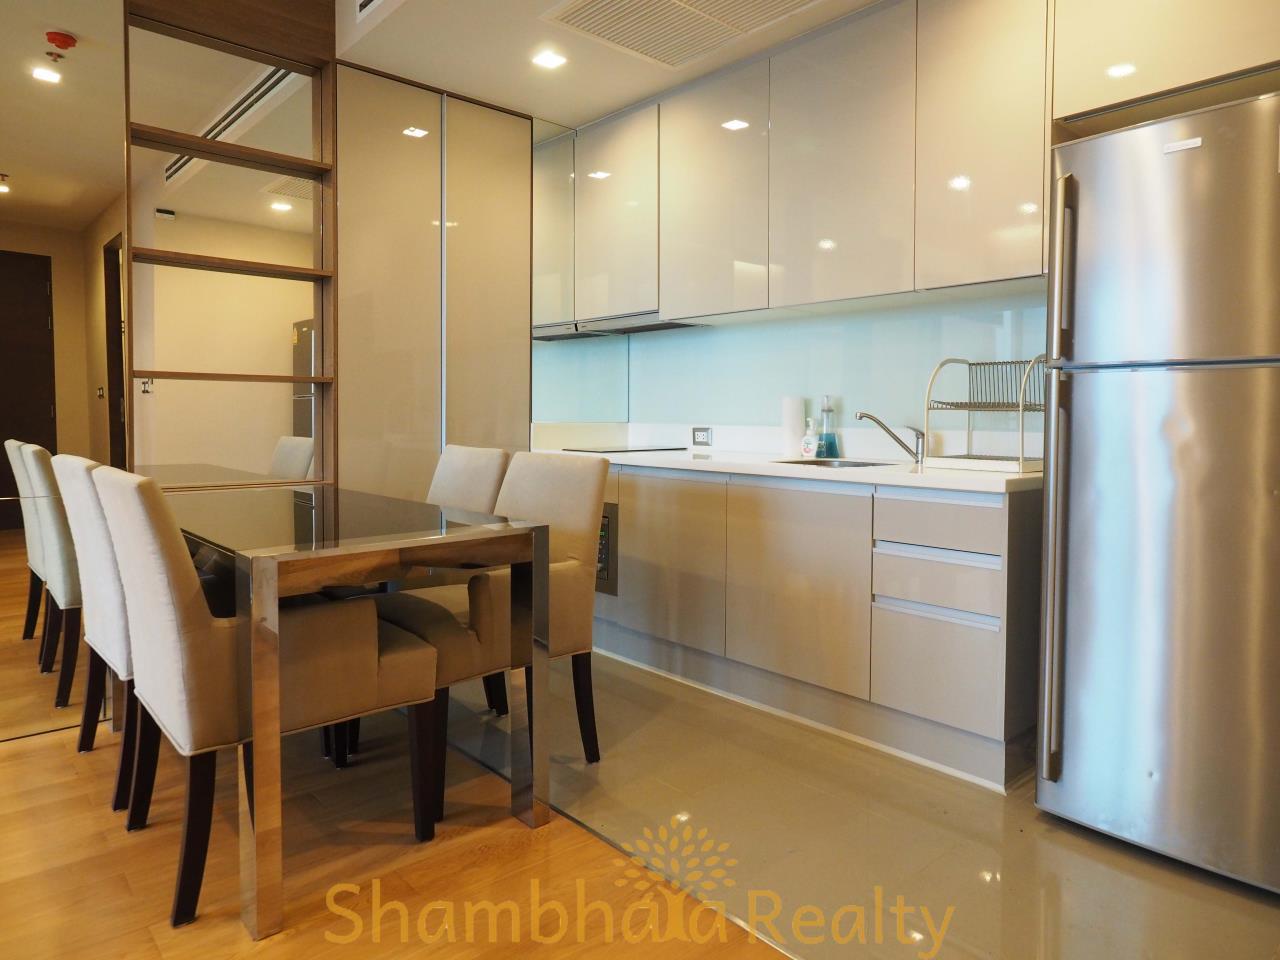 Shambhala Realty Agency's The Address Asoke Condominium for Rent in New Phetchaburi 8